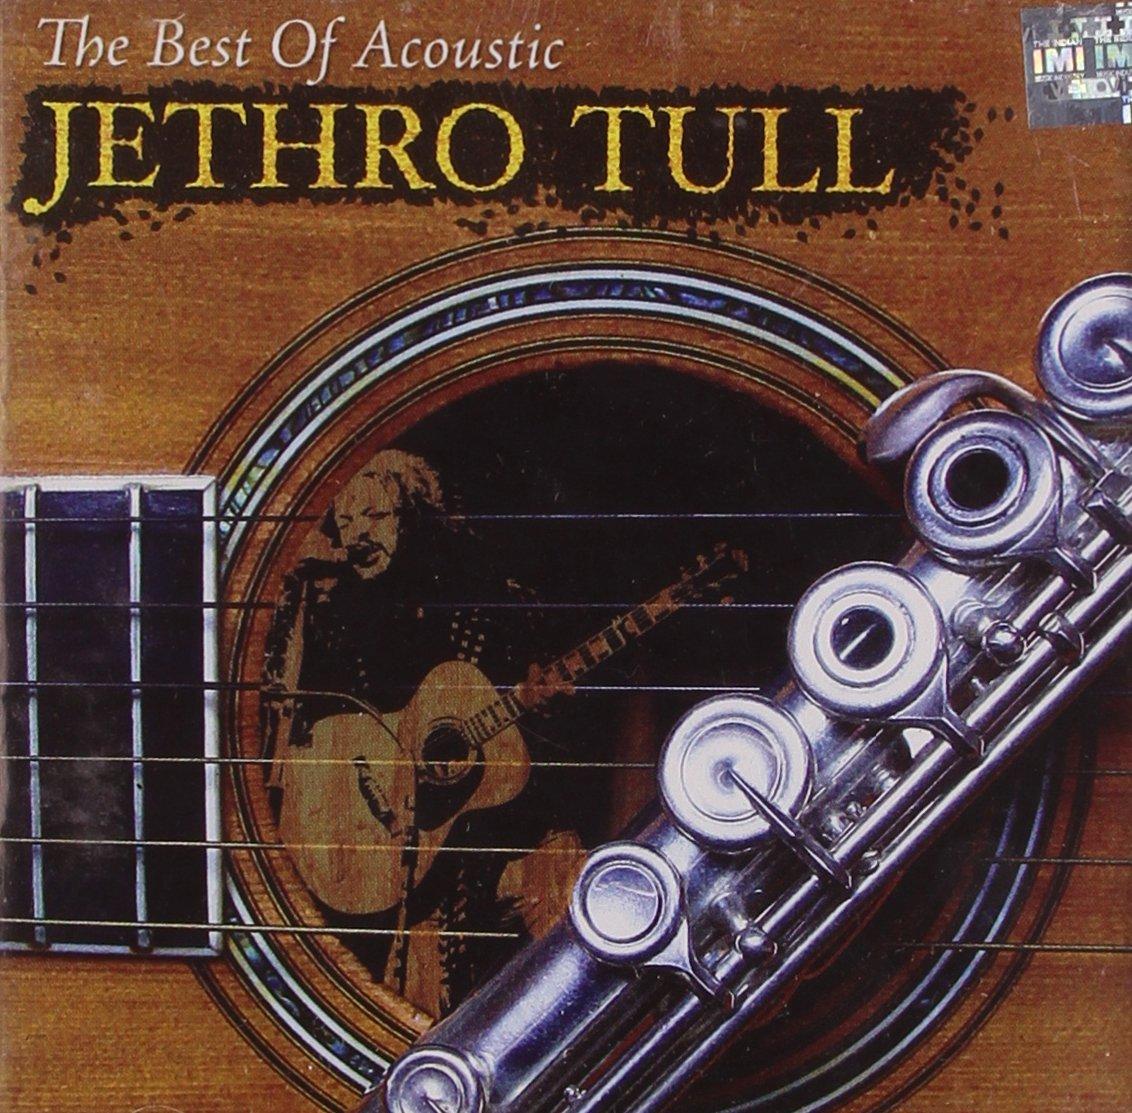 Jethro Tull - The Best Of Acoustic Jethro Tull - Amazon.com Music